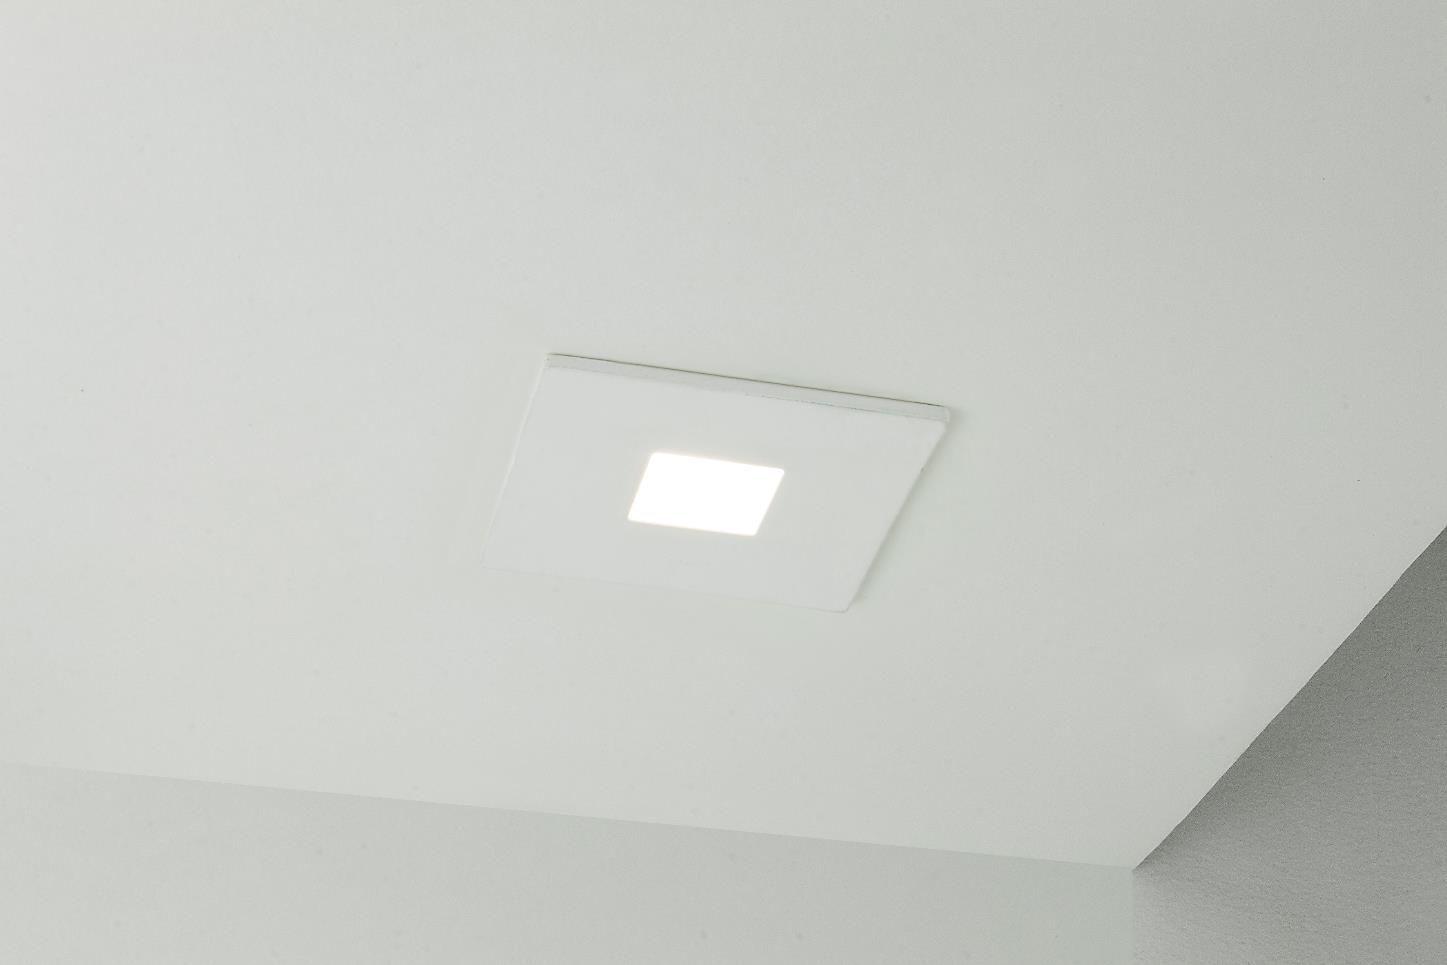 Spot Embutir NEWLINE IN50931 LISSE Pin Hole 1 Mini Dicróica GU10 63x63x70mm